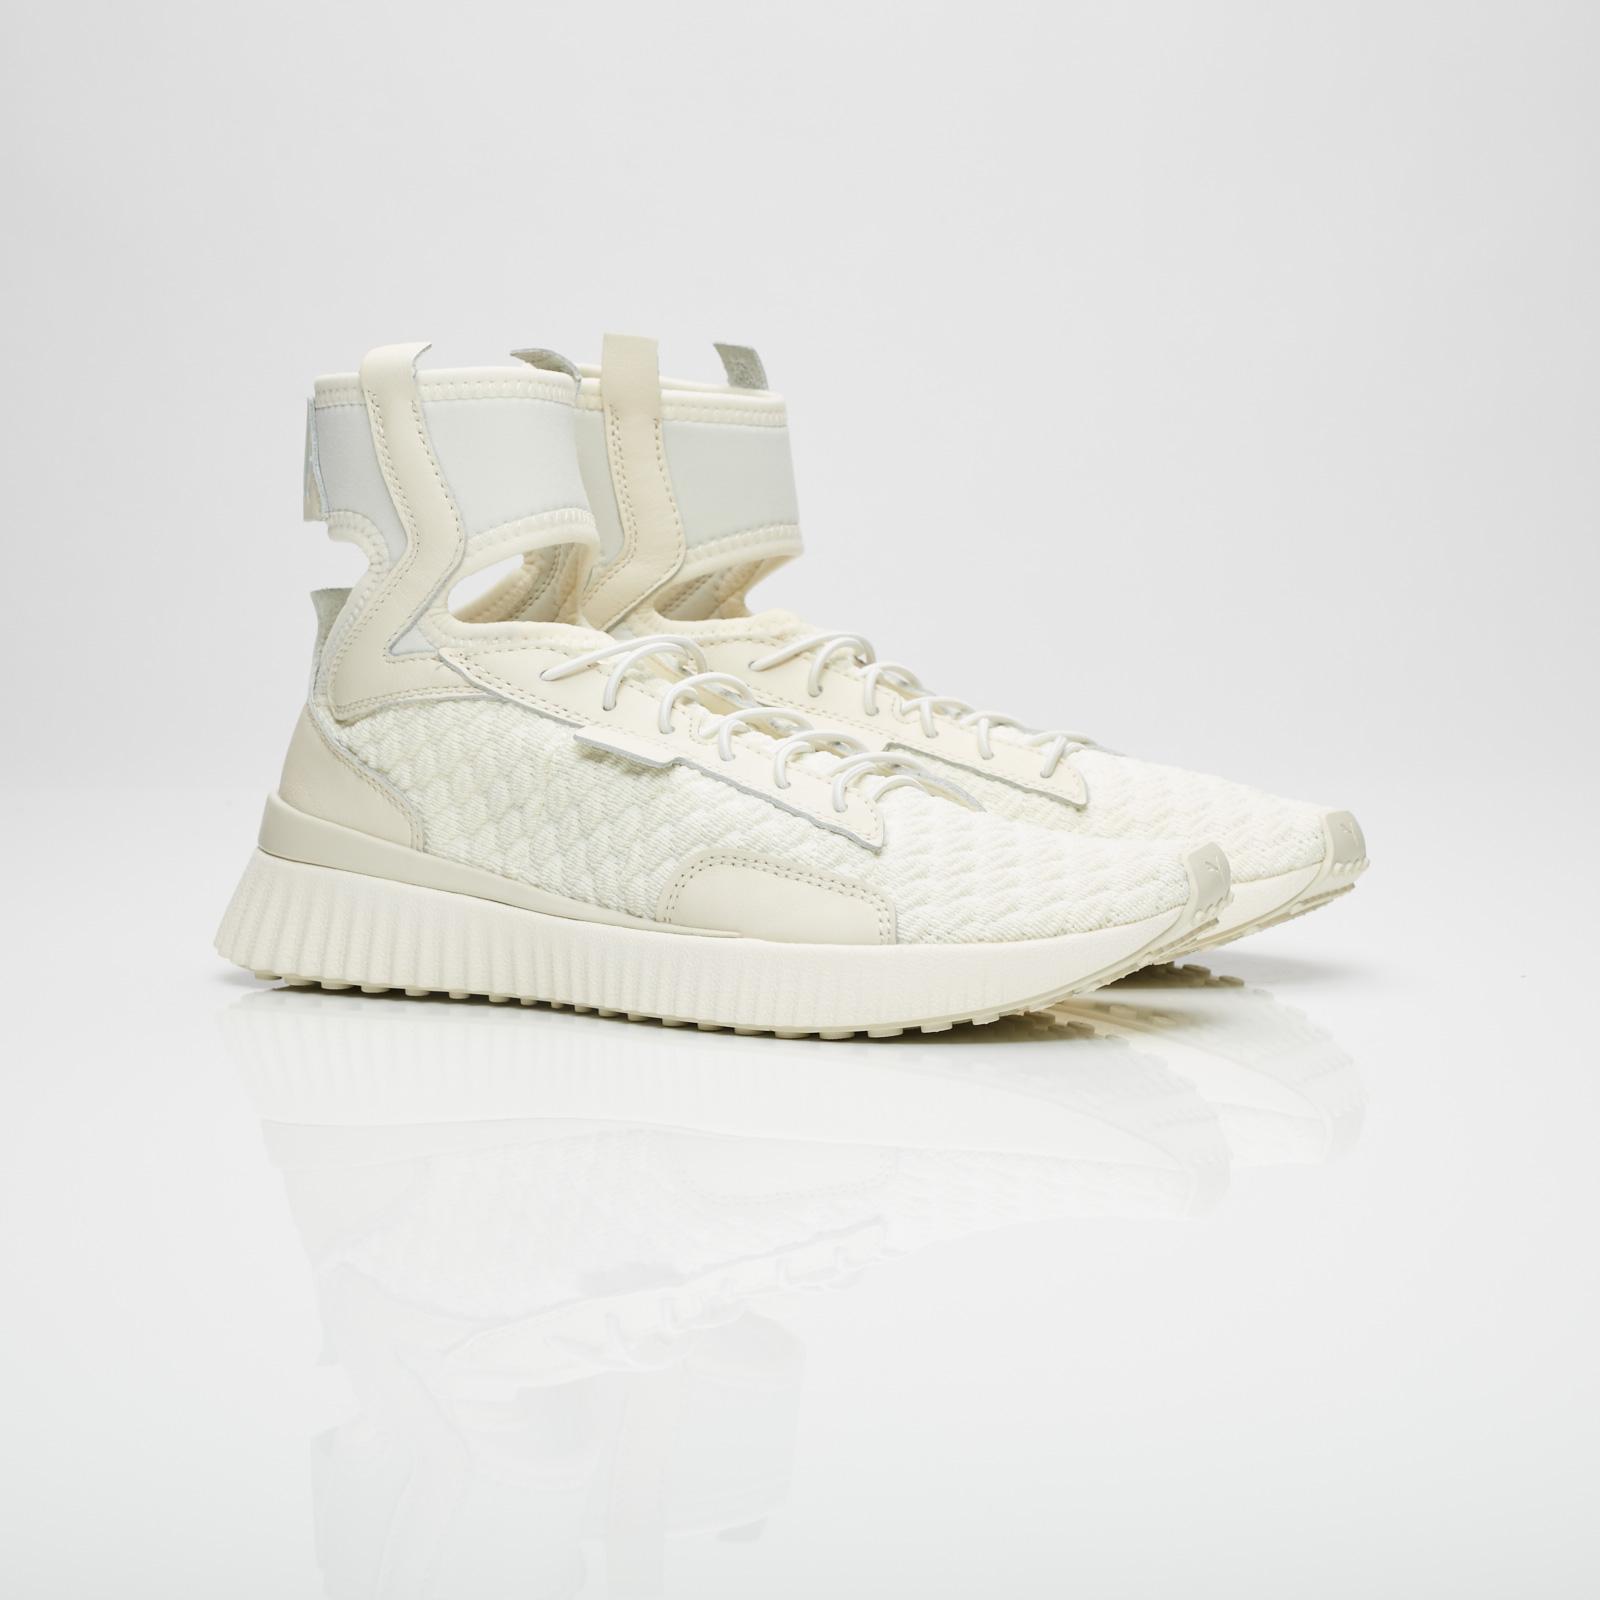 buy popular 05139 1bff8 Puma Fenty Trainer Mid Geo - 191231-01 - Sneakersnstuff ...